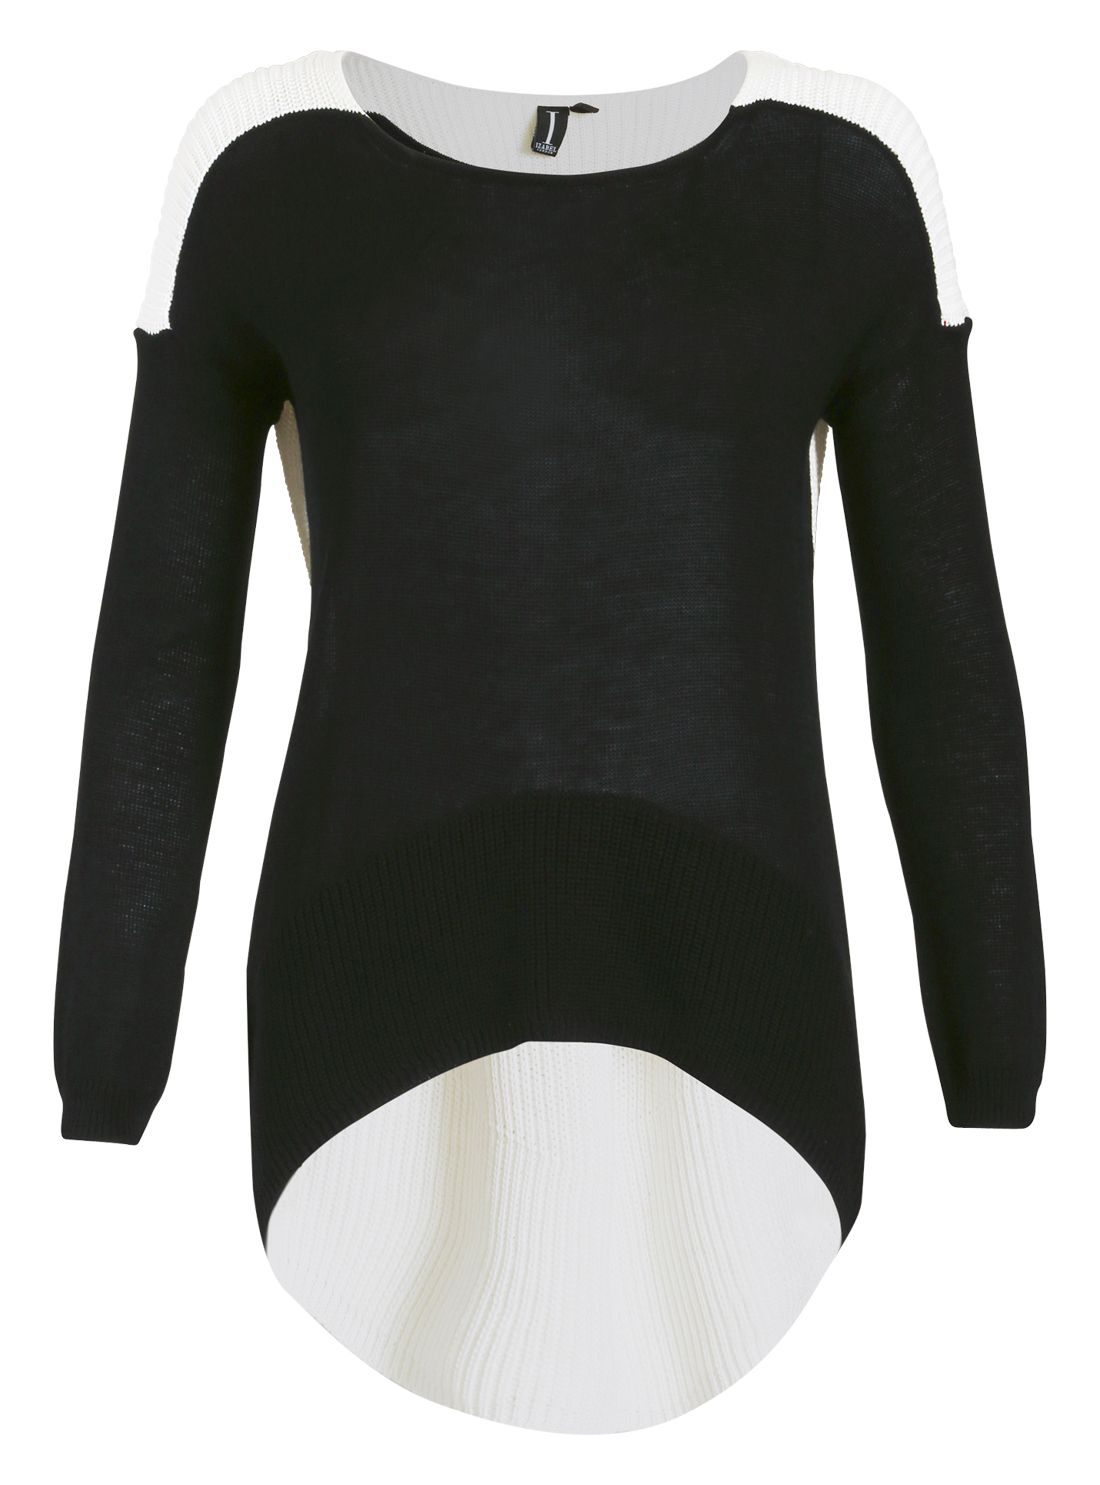 Lyst - Izabel London Oversized Casual Top in Black